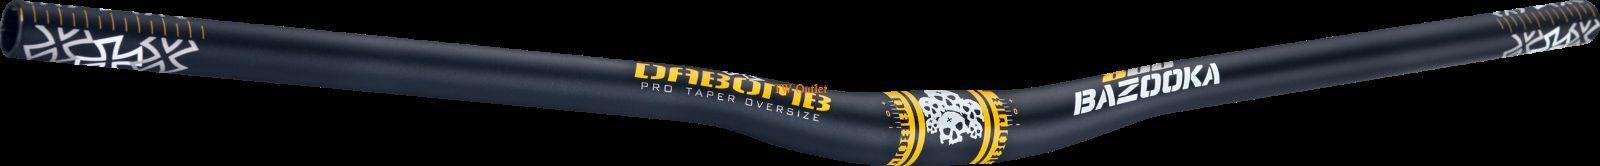 "New Da Bomb /""BAZOOKA 800/"" MTB AM-DH Riser 9° Handlebar 31.8 mm//800mm 6 Colors"